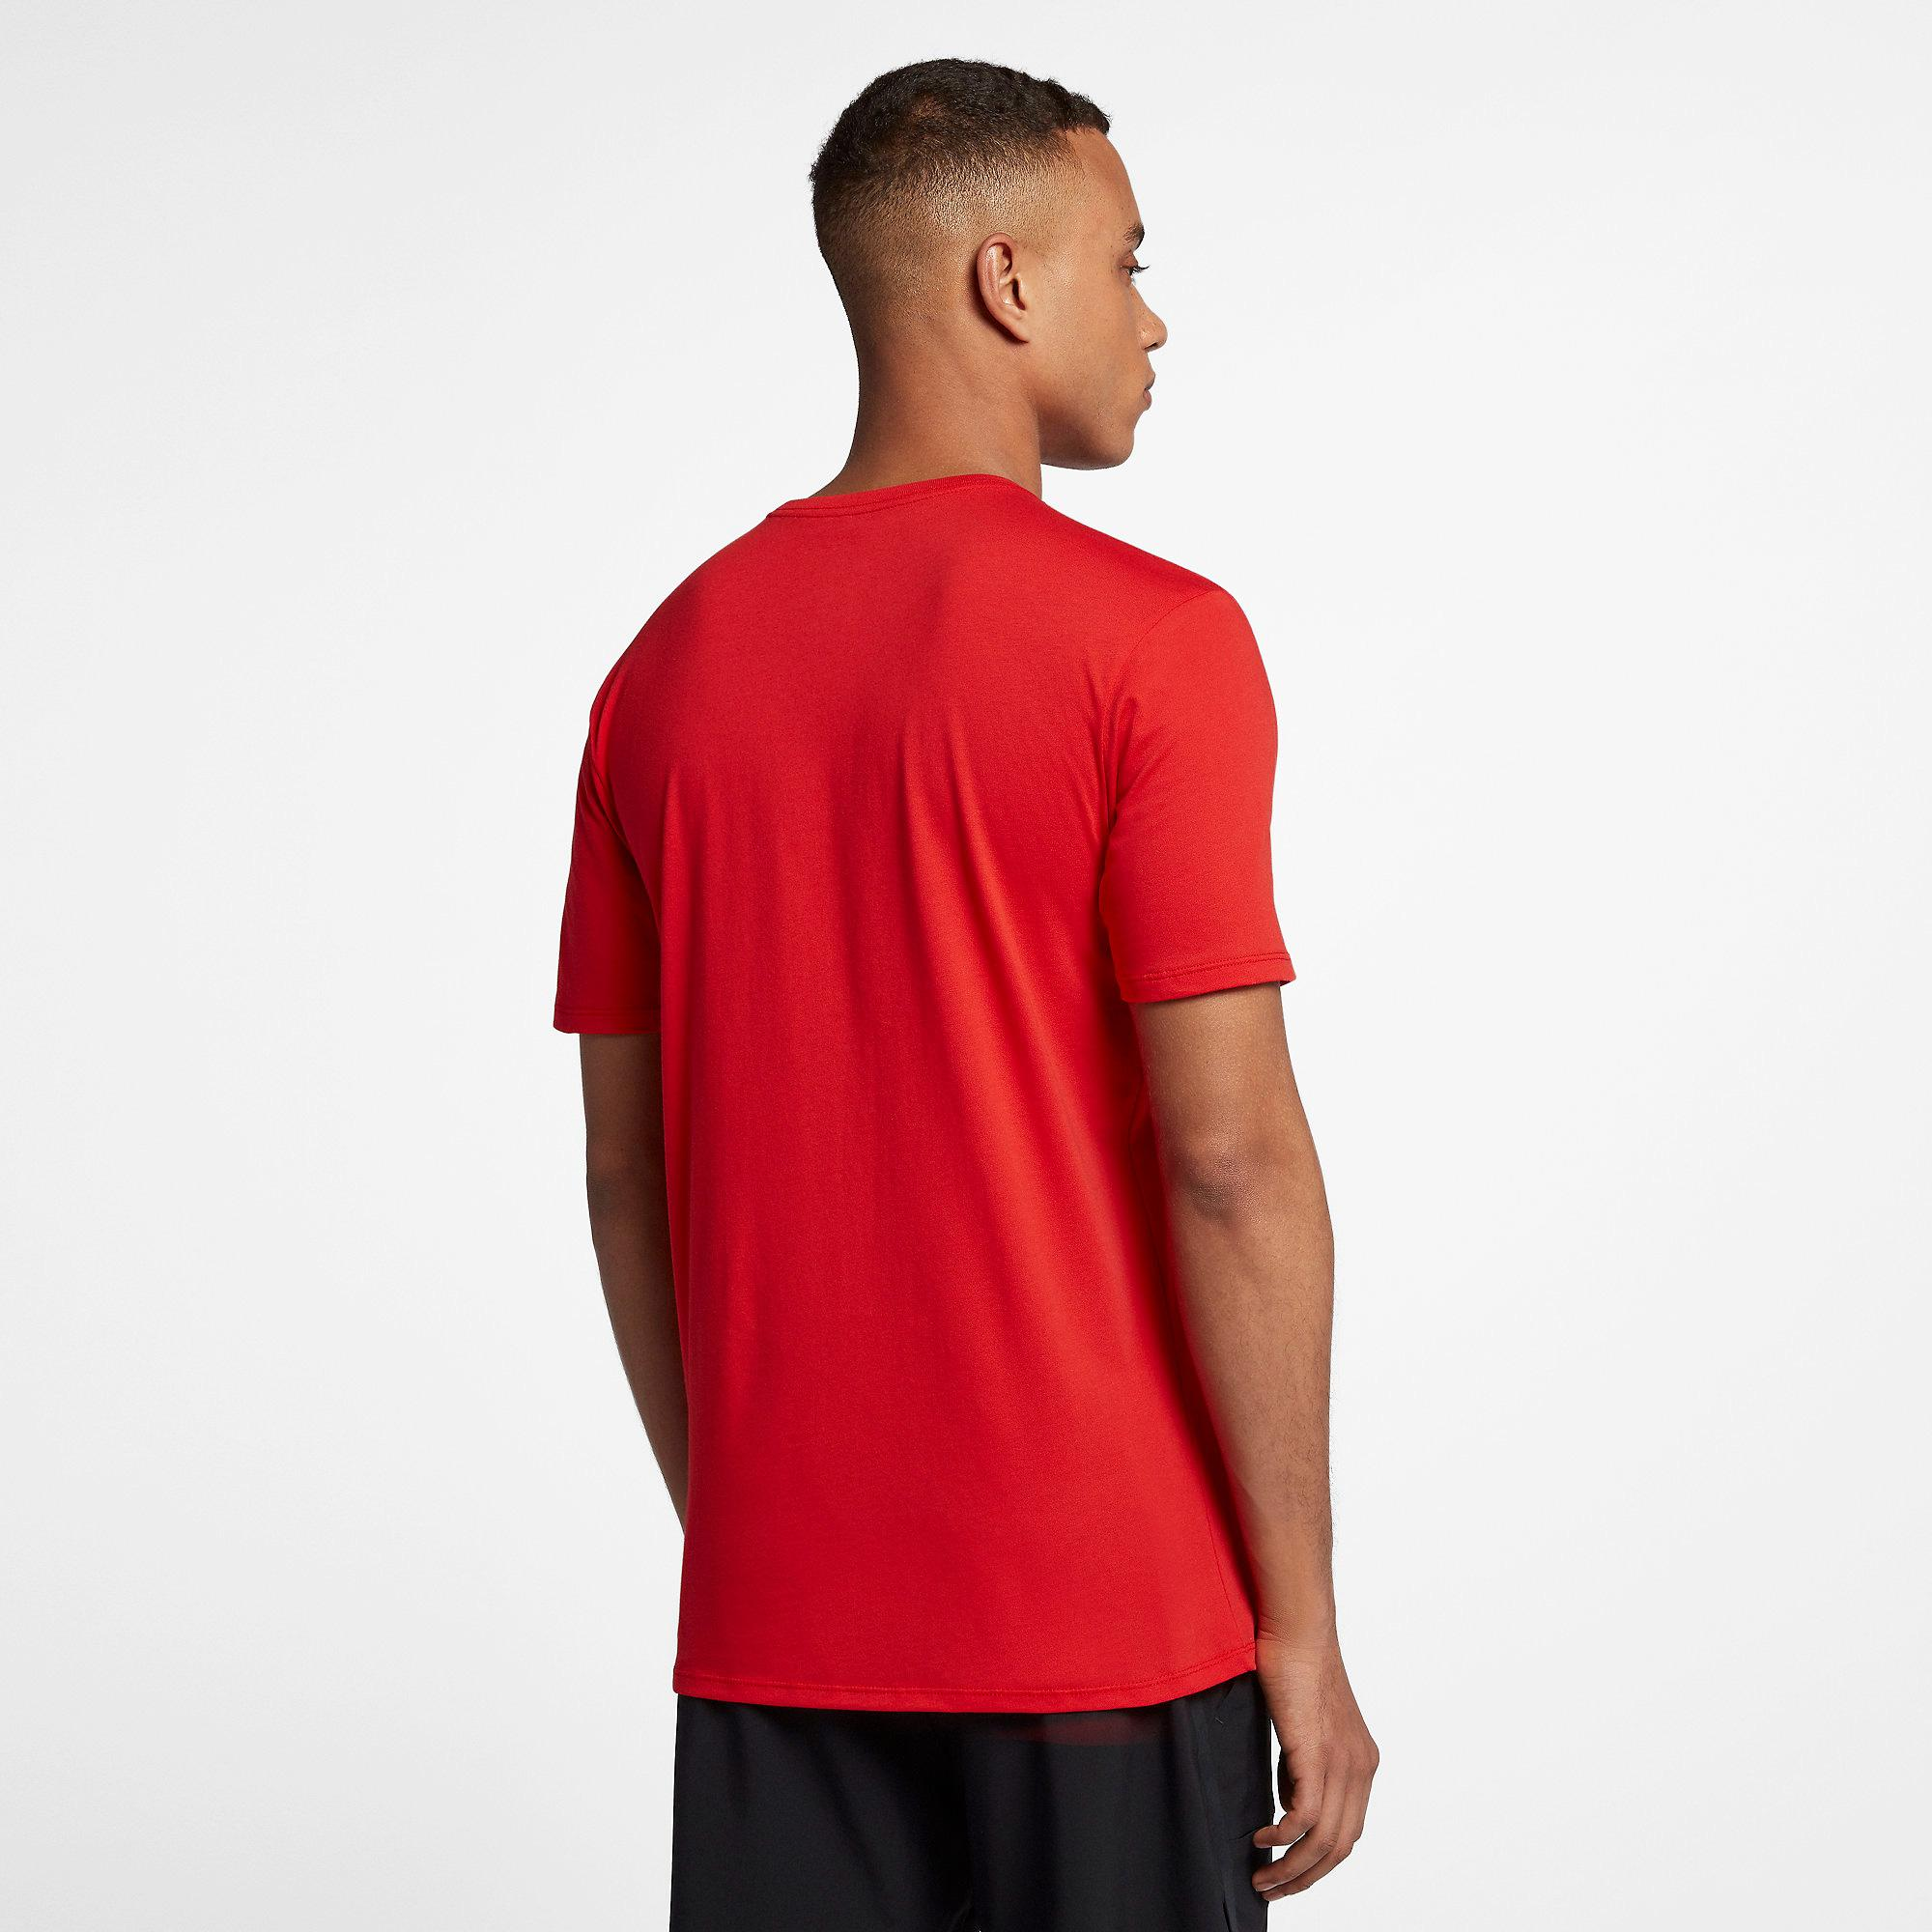 cce403980 Nike Mens RF T-Shirt - Habanero Red/Total Crimson - Tennisnuts.com